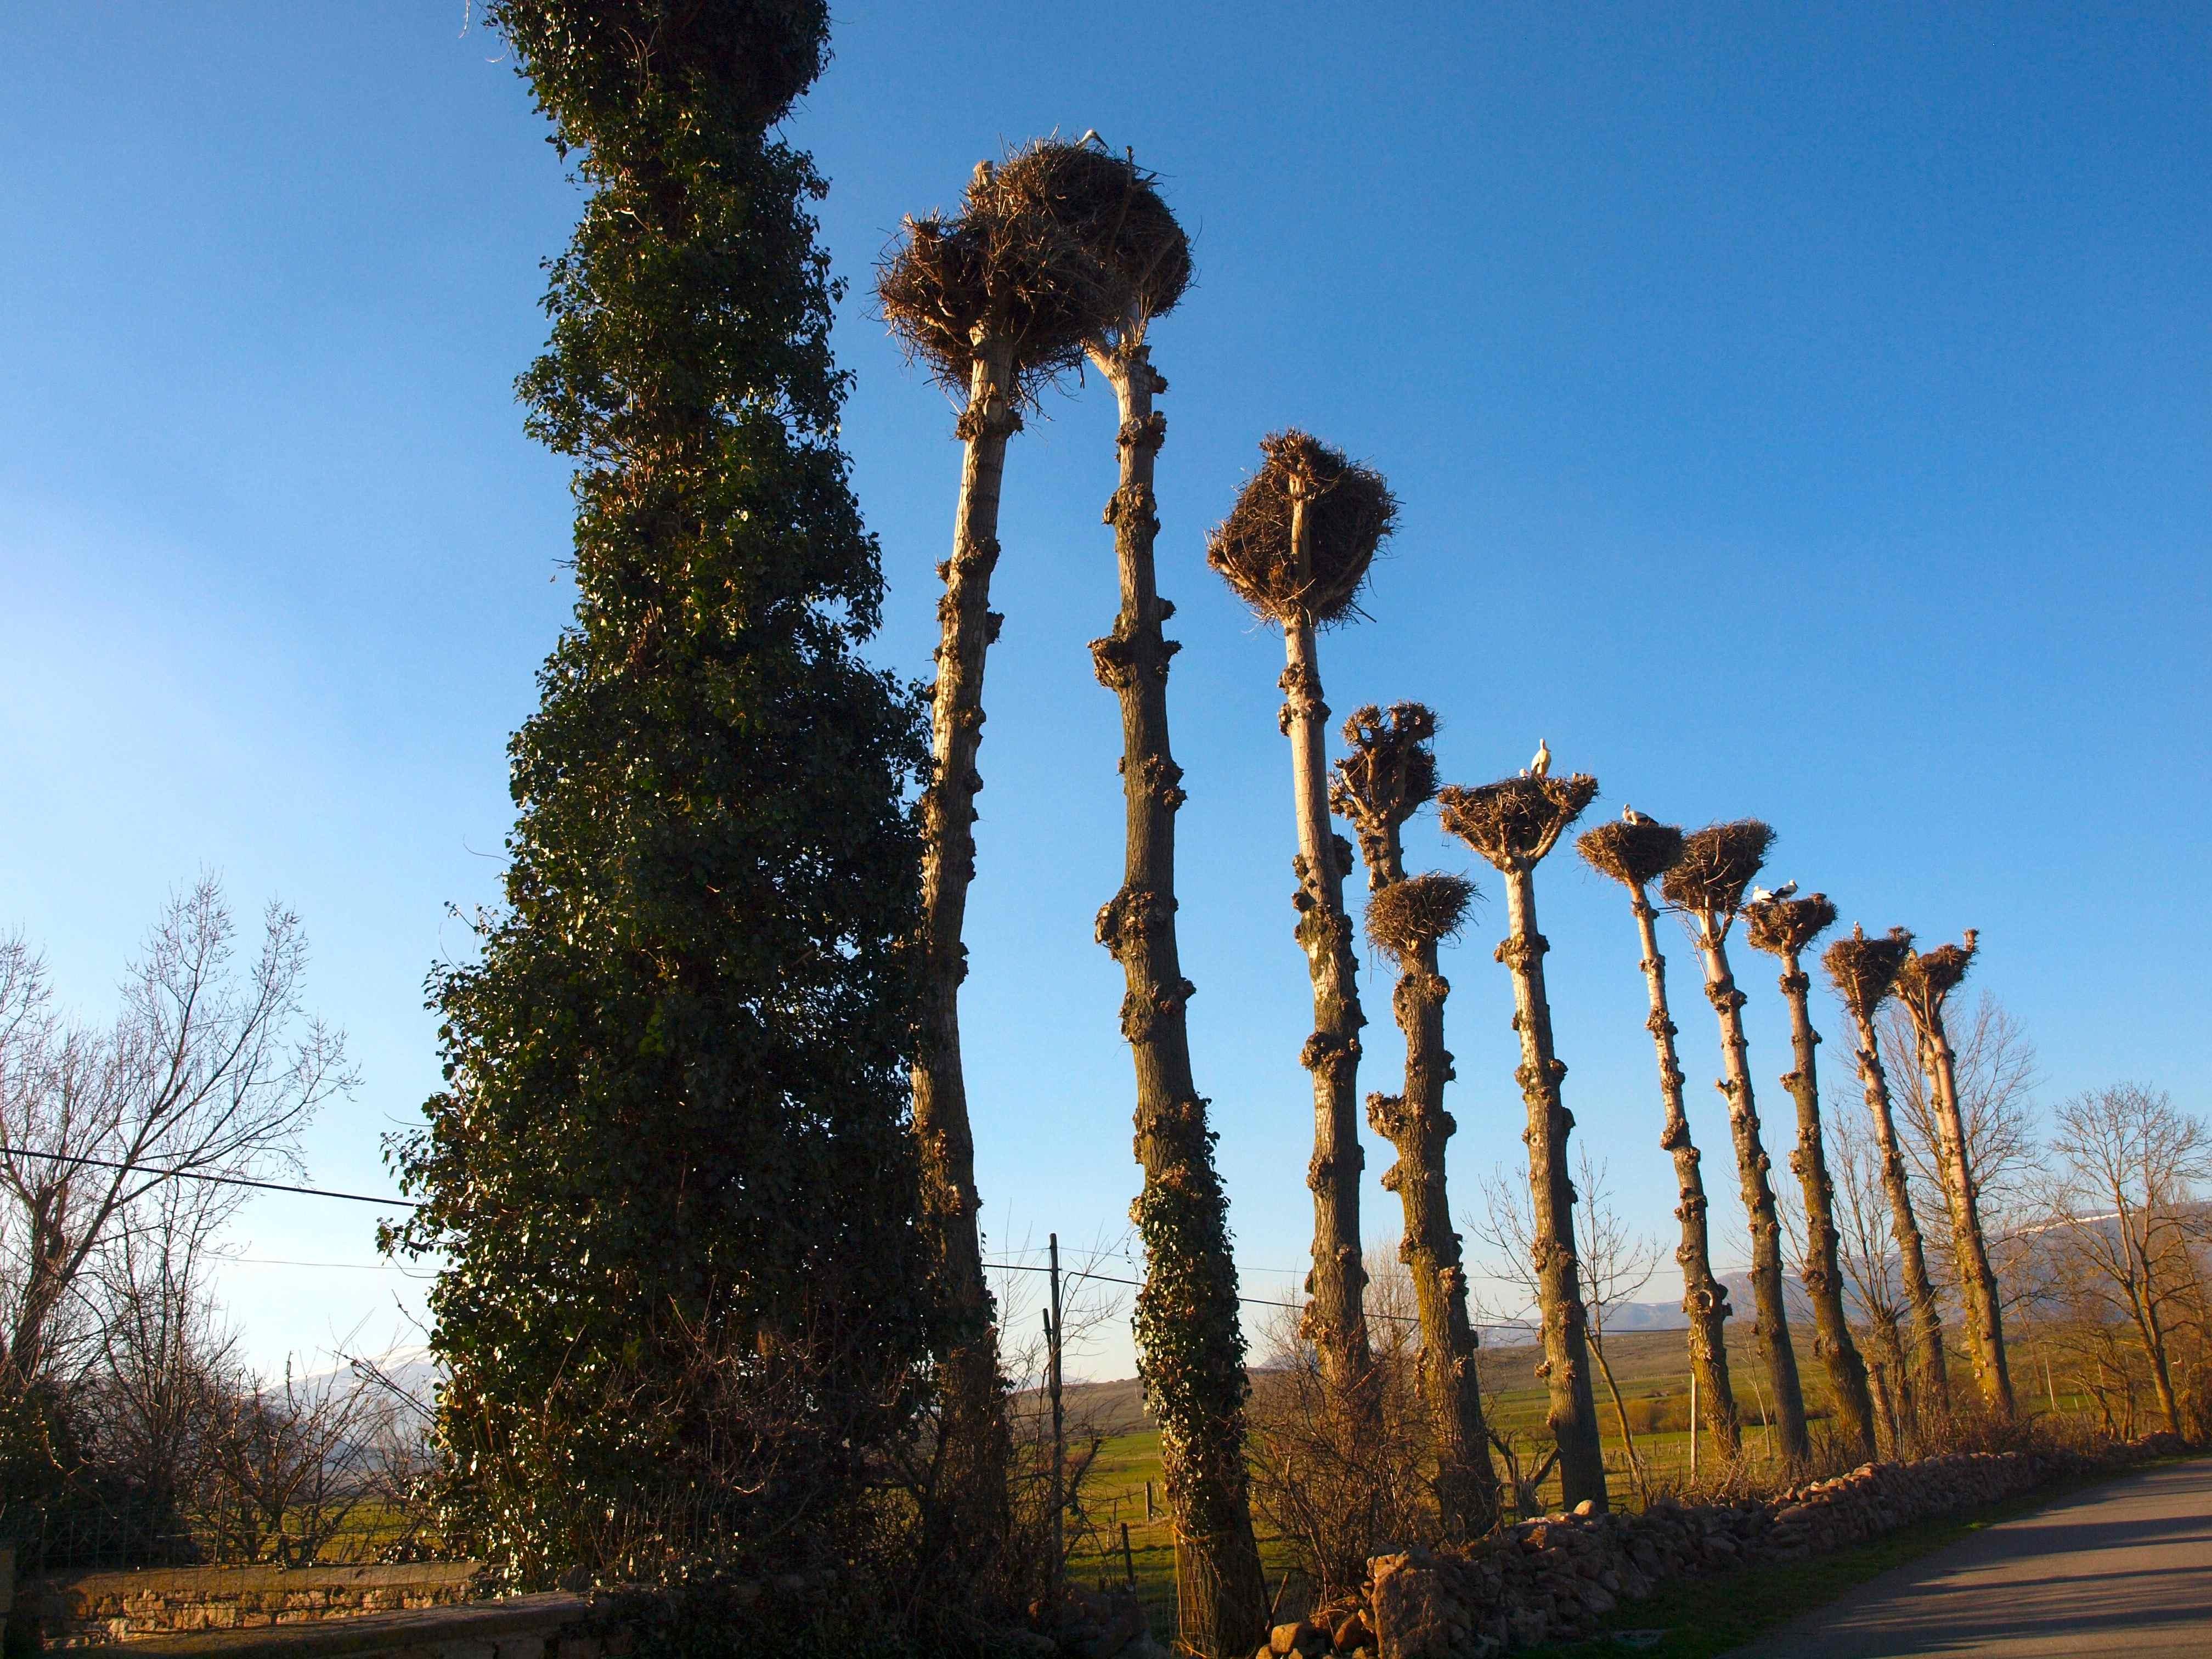 Nidos de cigüeñas a la entrada de Villaescusa.